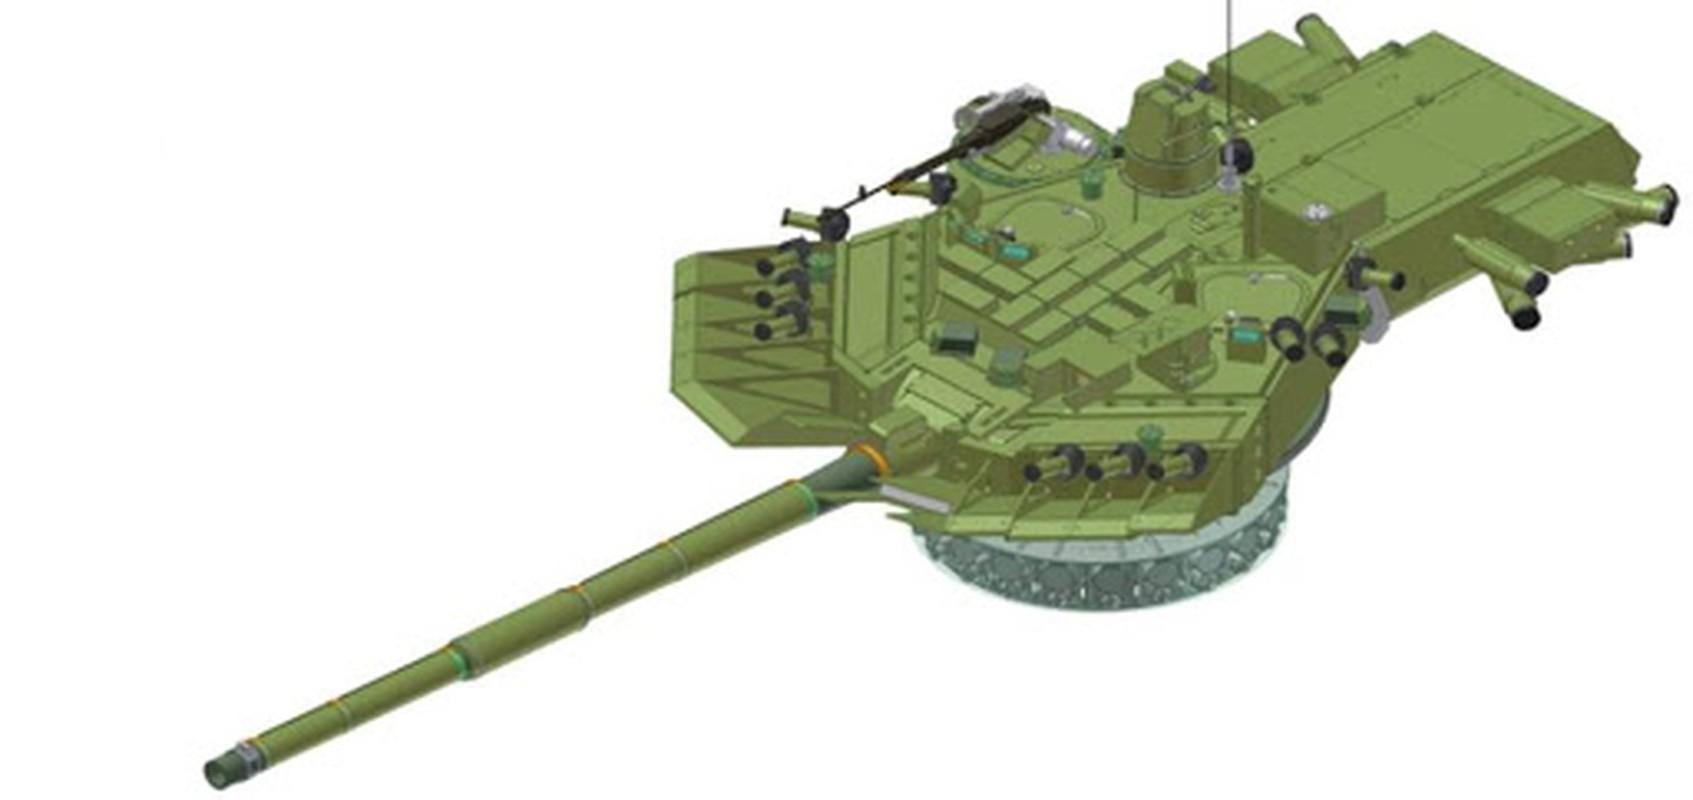 Bat ngo xuat hien phien ban xe tang T-80 manh ngang voi T-14 Armata-Hinh-11